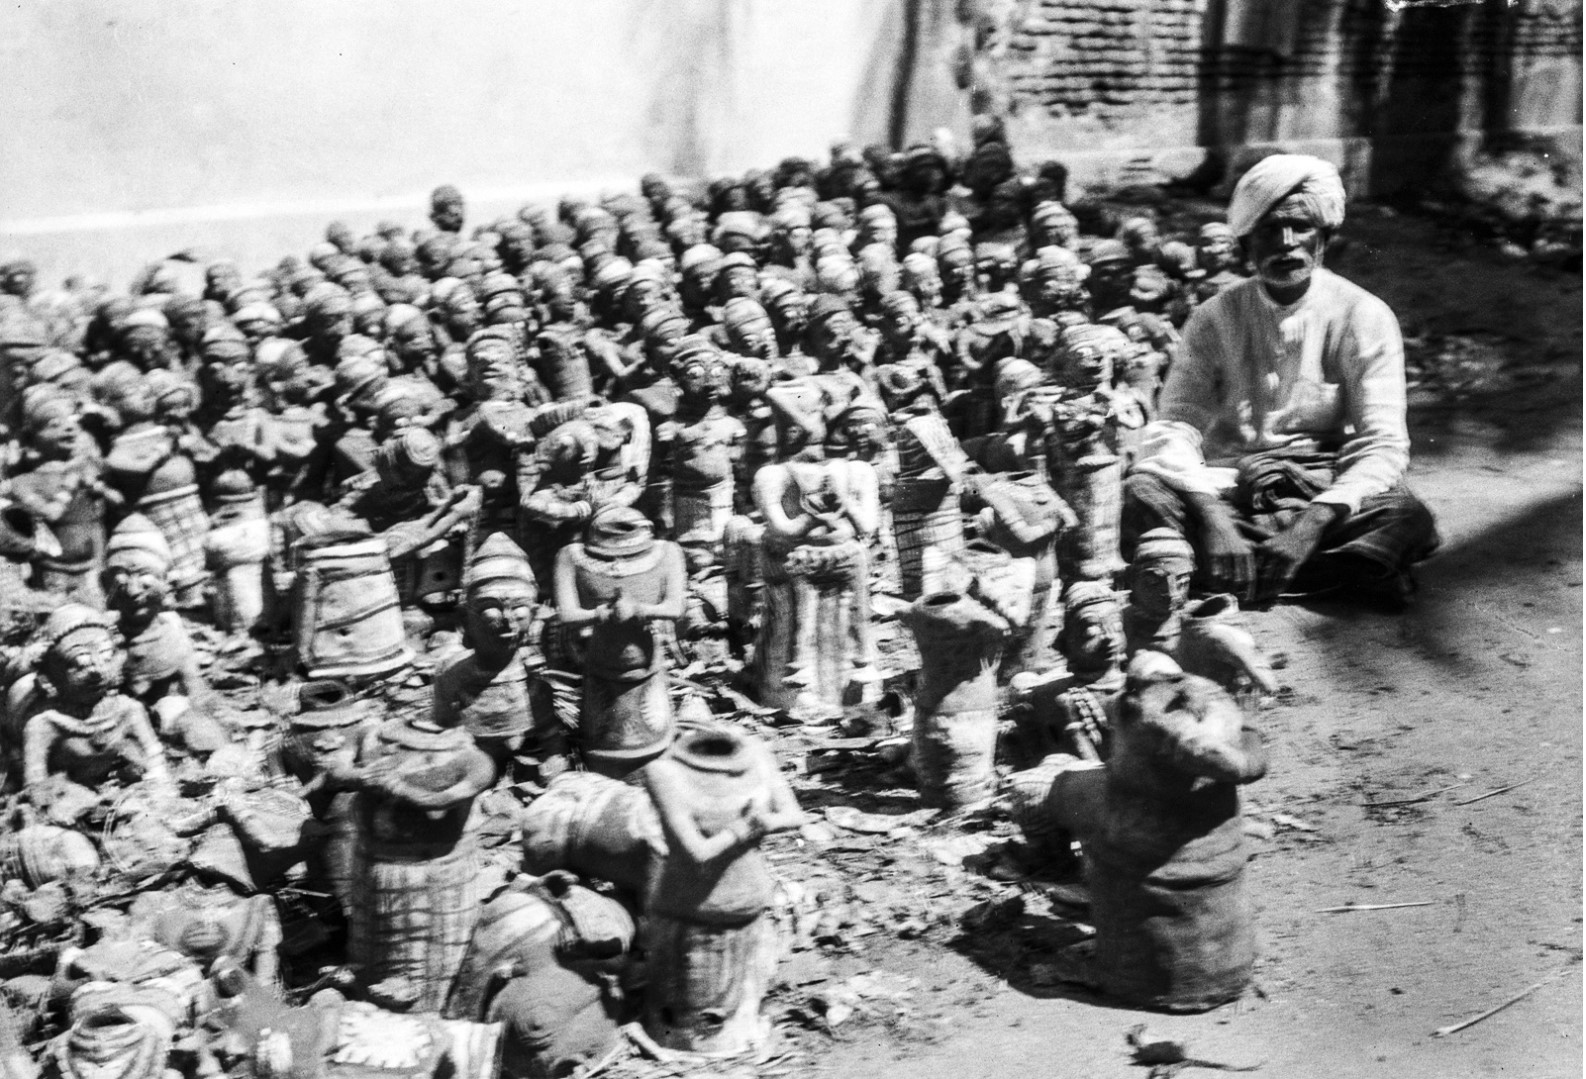 452. Мадрас. Храм богини Кали Вотивные статуэтки возле храма